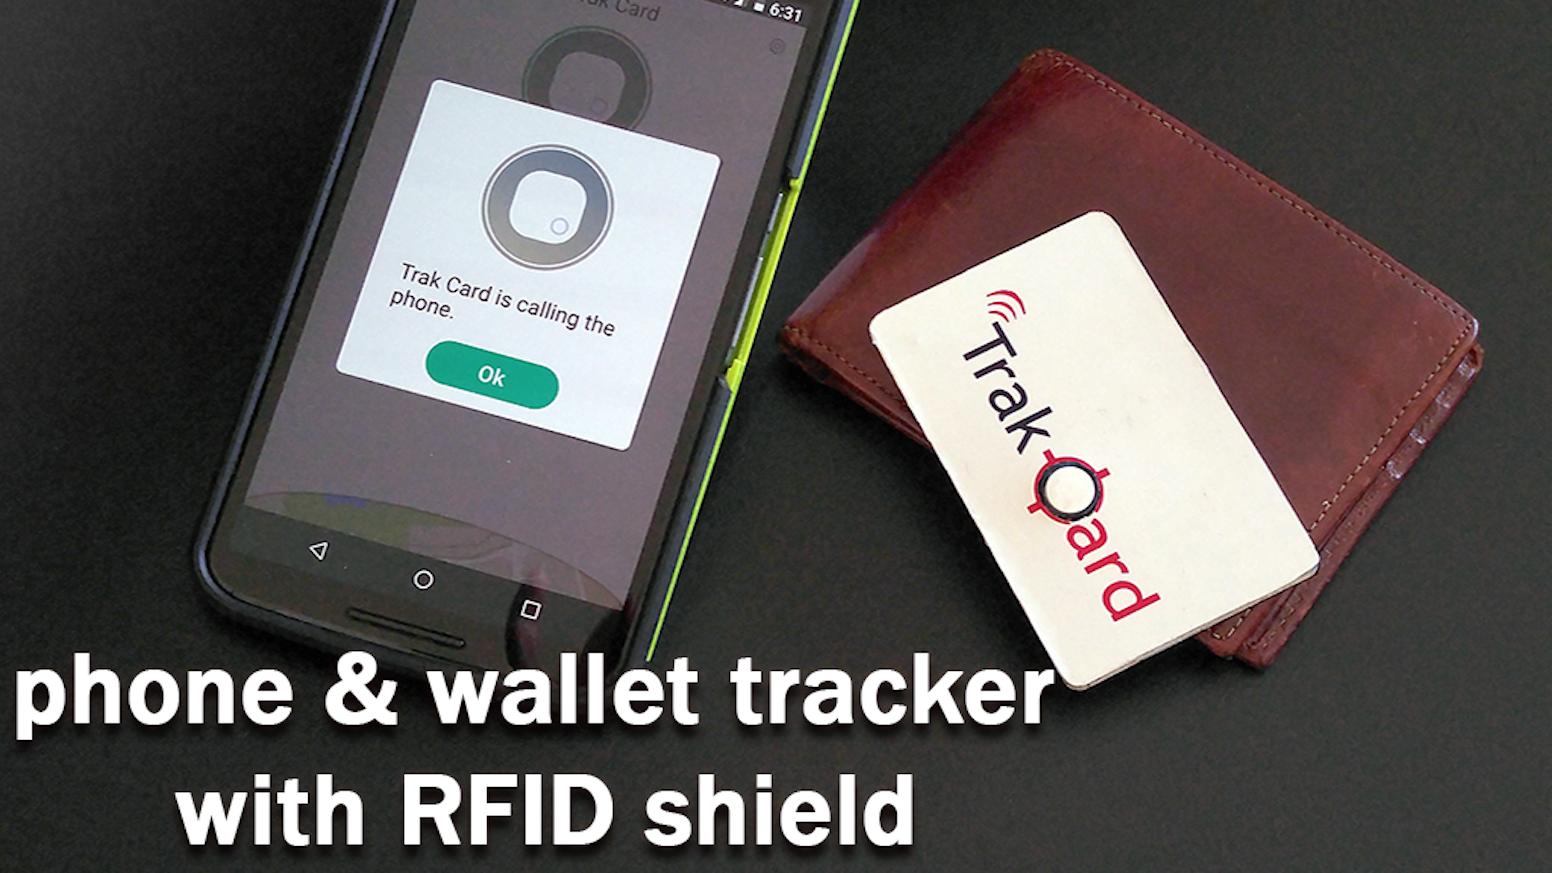 Trak Card Wallet & Phone Tracker w Find Button + RFID Shield